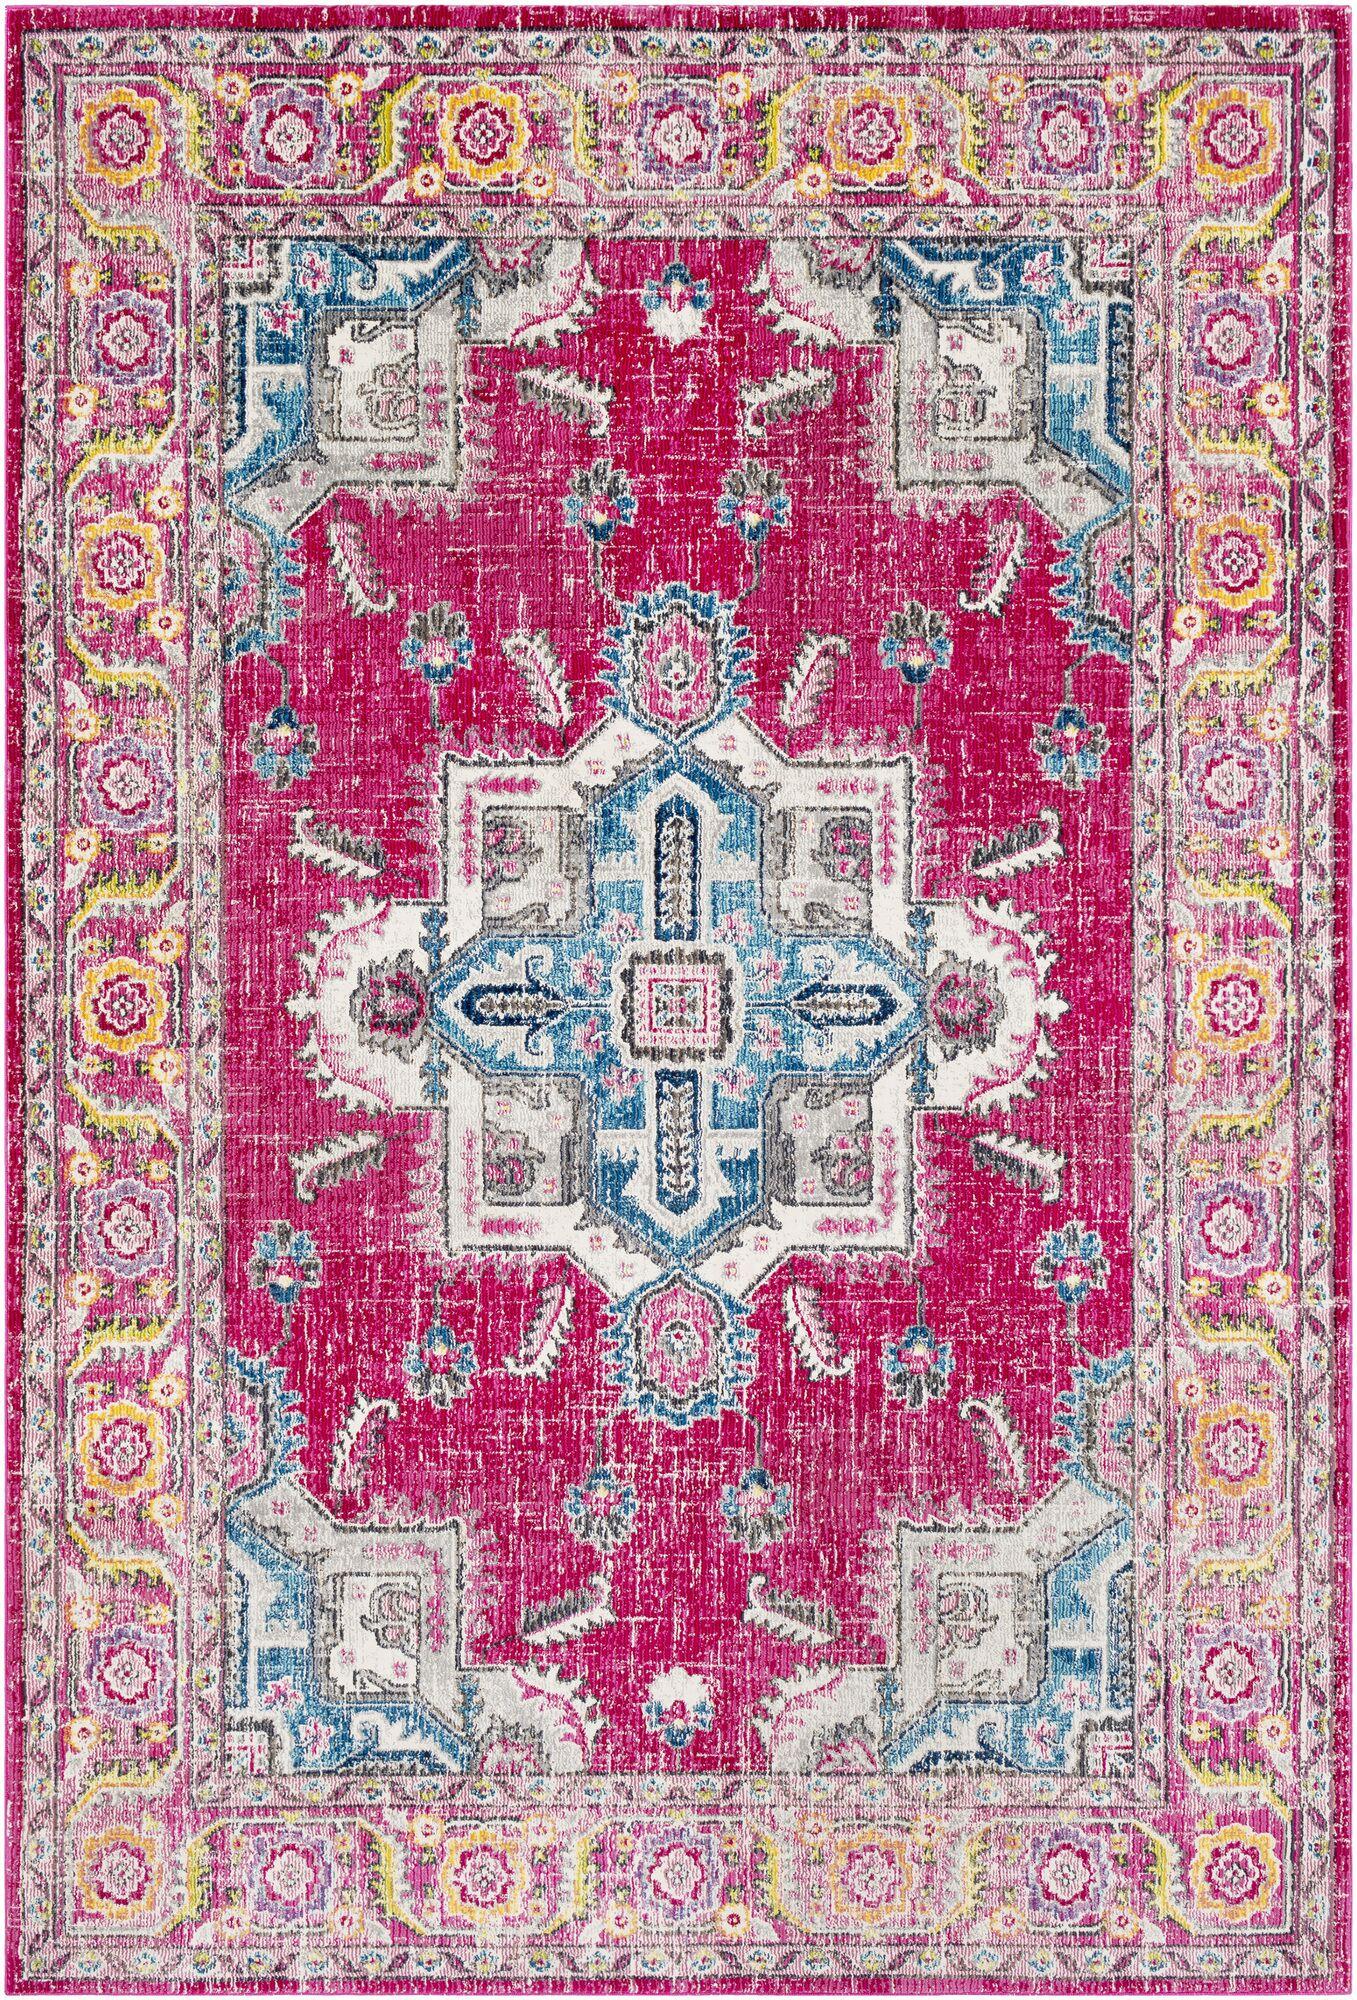 Tillamook Pink/Rose Area Rug Rug Size: Rectangle 7'10